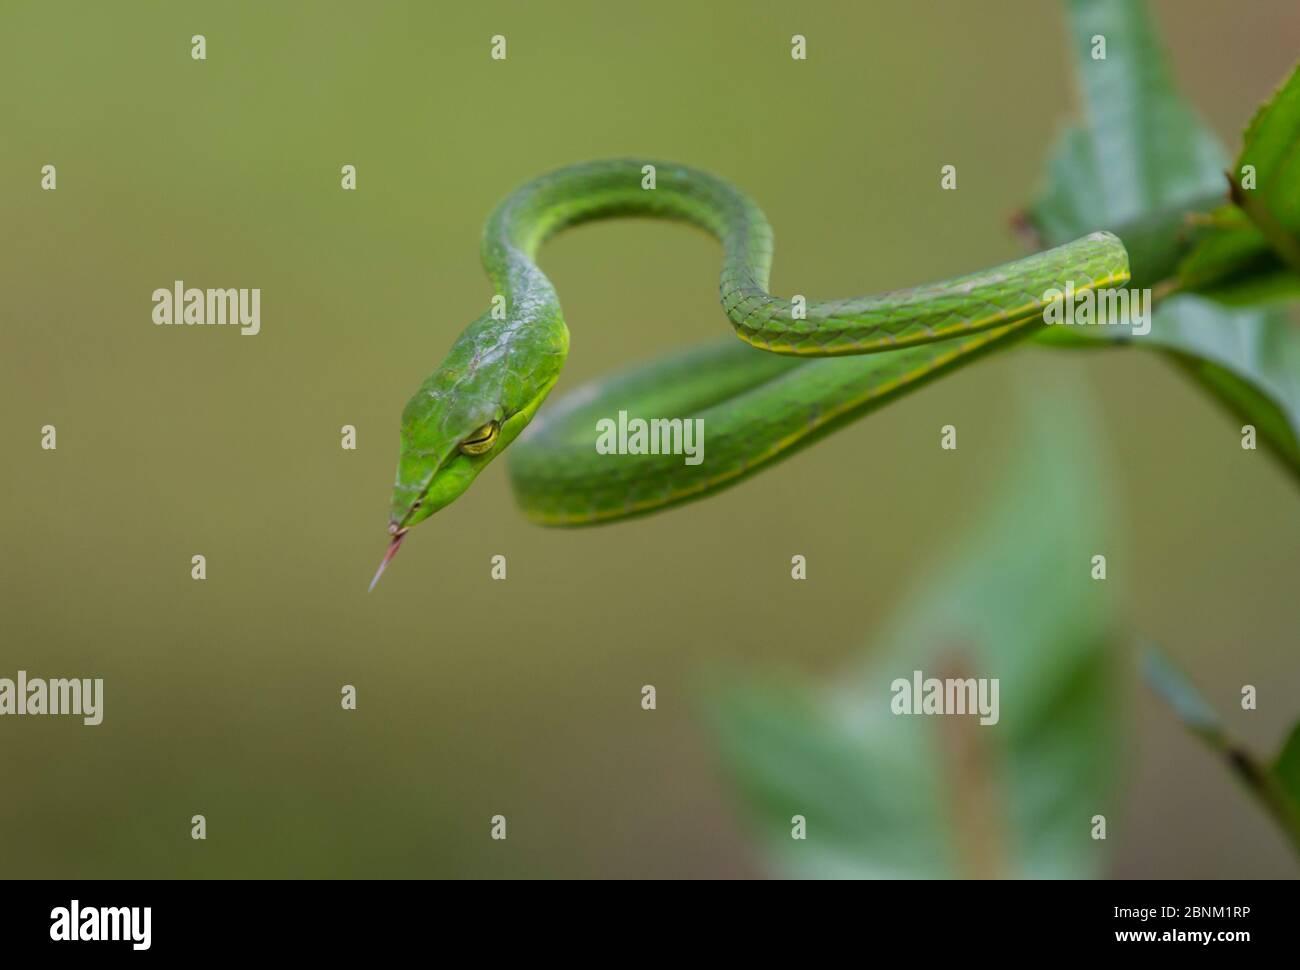 Serpent vert de vigne (Aheatulla nasuta), Agumbe, Karnataka, Inde. Banque D'Images